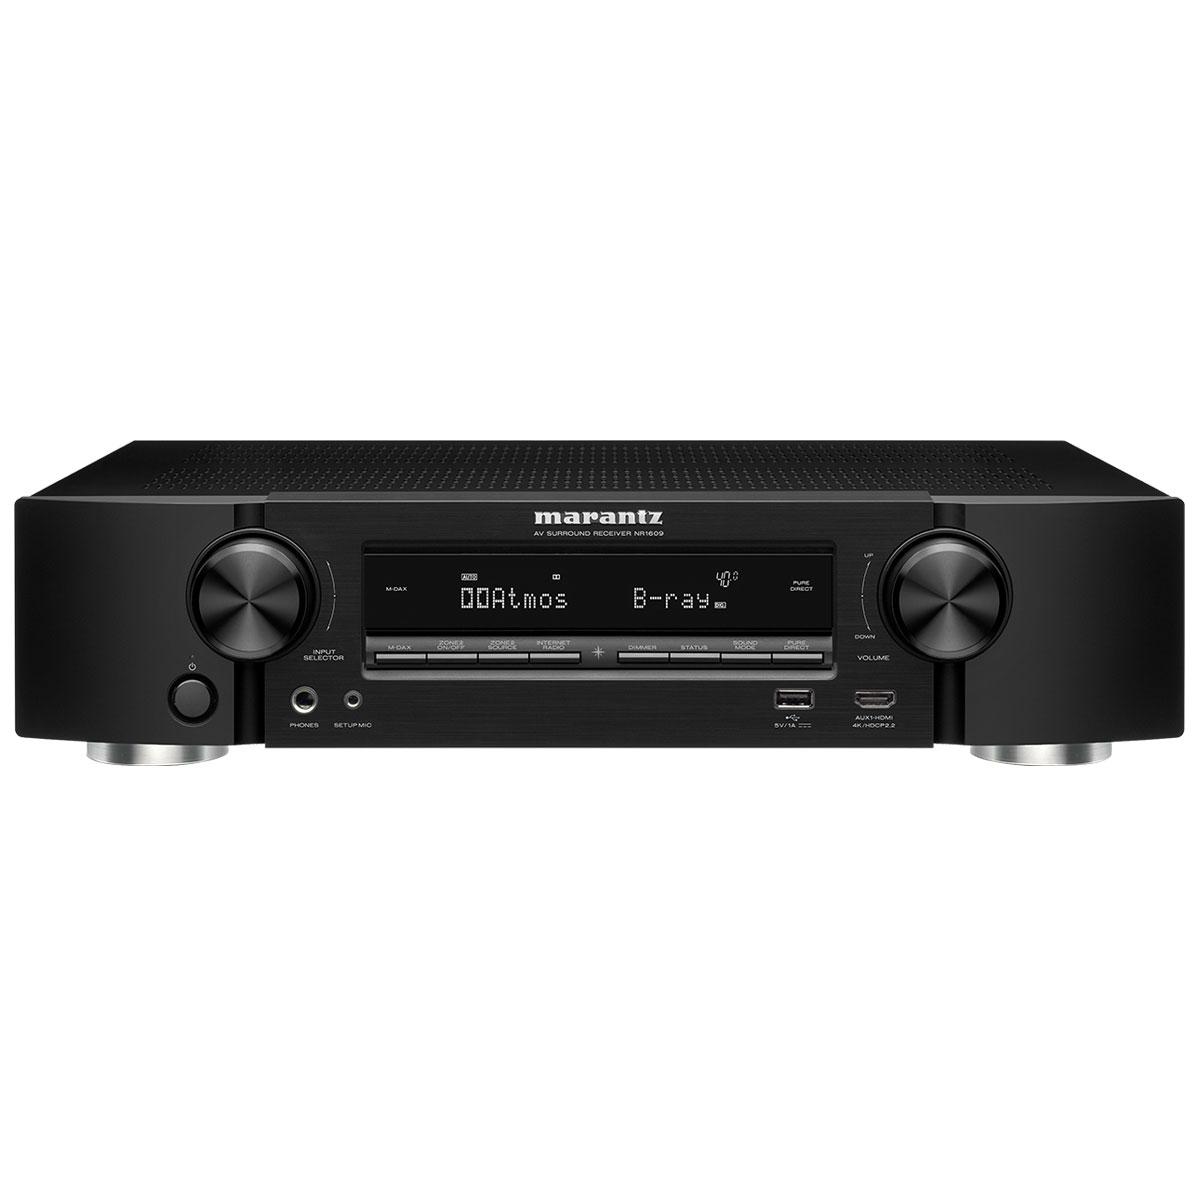 Ampli home cinéma Marantz NR1609 Noir Ampli-tuner Home Cinema Slim 3D Ready 5.2 - Dolby Atmos / DTS:X - 8x HDMI 4K UHD, HDCP 2.2, HDR - Multiroom - Wi-Fi/Bluetooth/AirPlay 2 - Amazon Alexa